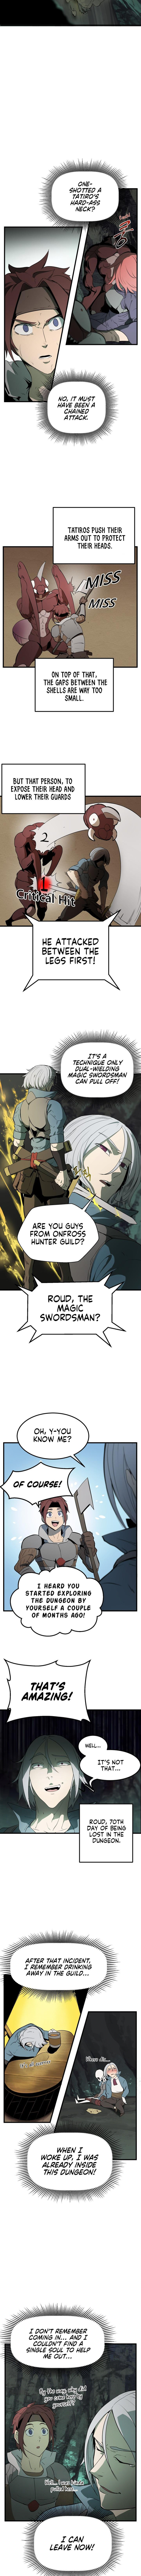 Survival Story Of A Sword King In A Fantasy World Vol.1 Chapter 8 page 6 - Mangakakalots.com